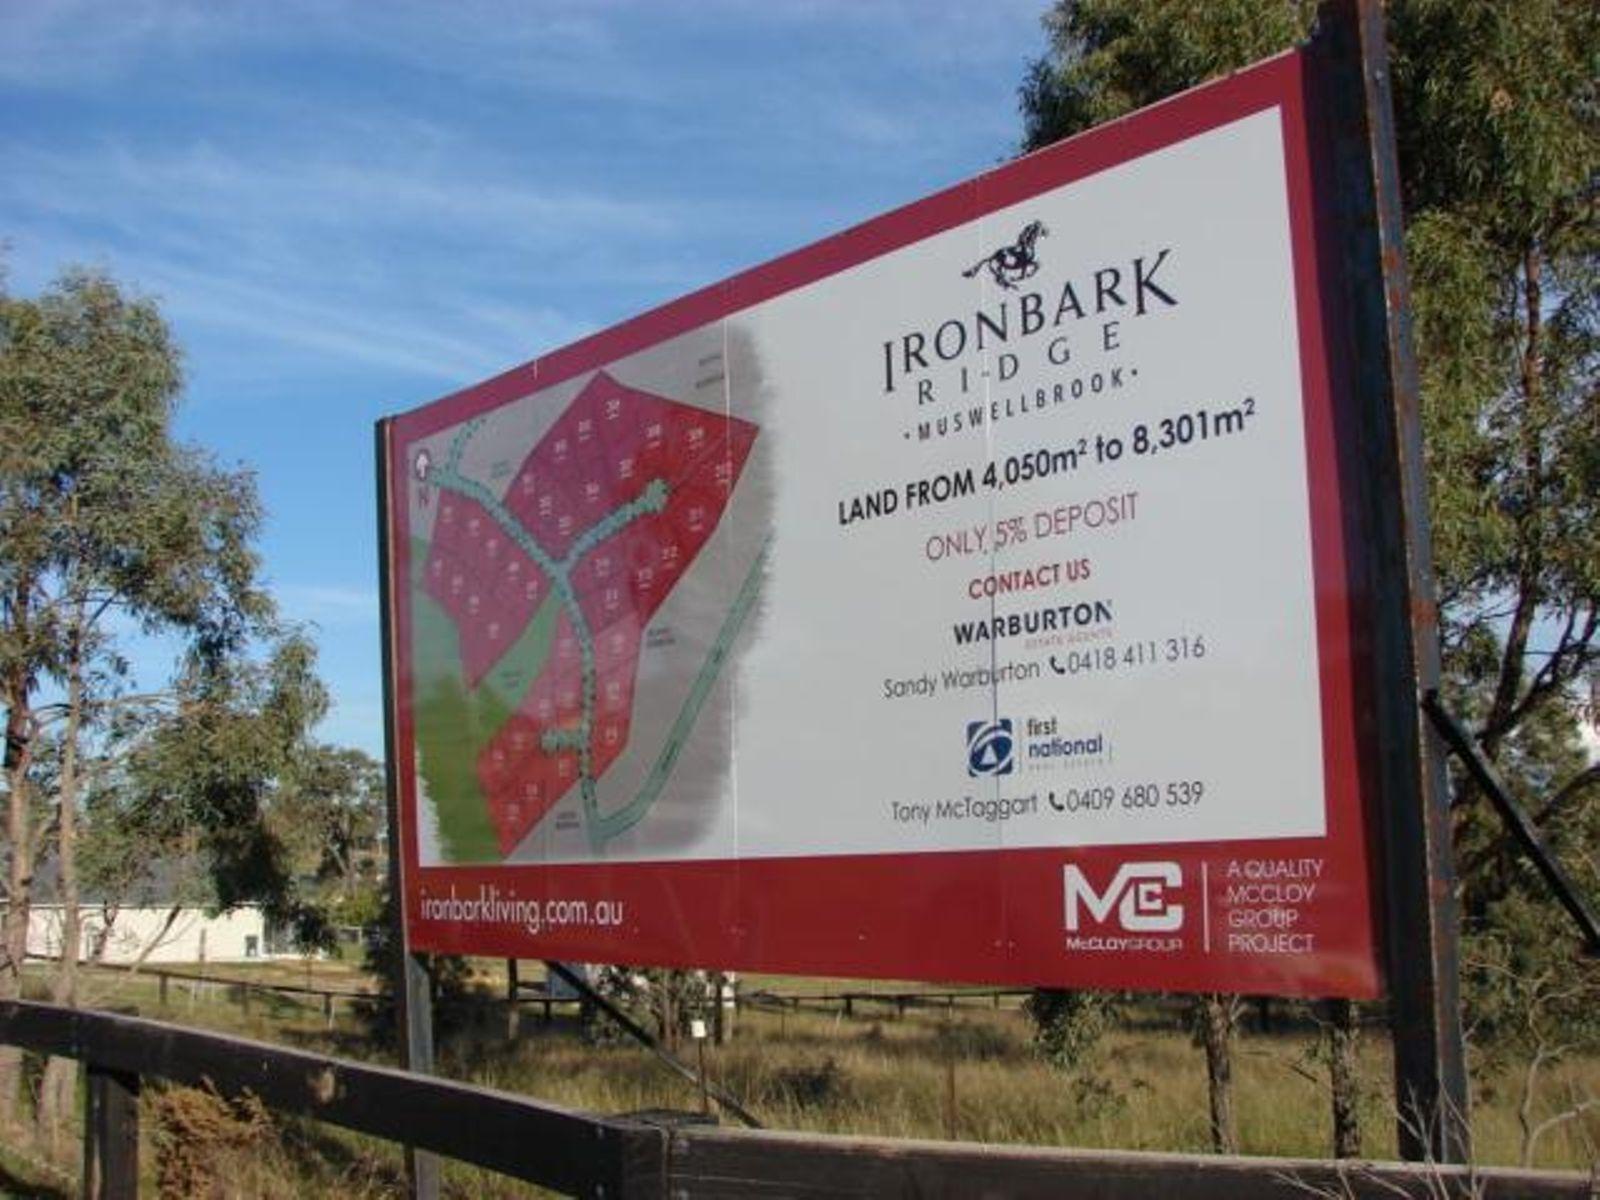 Lot 510 Stockyard Parade, Muswellbrook, NSW 2333